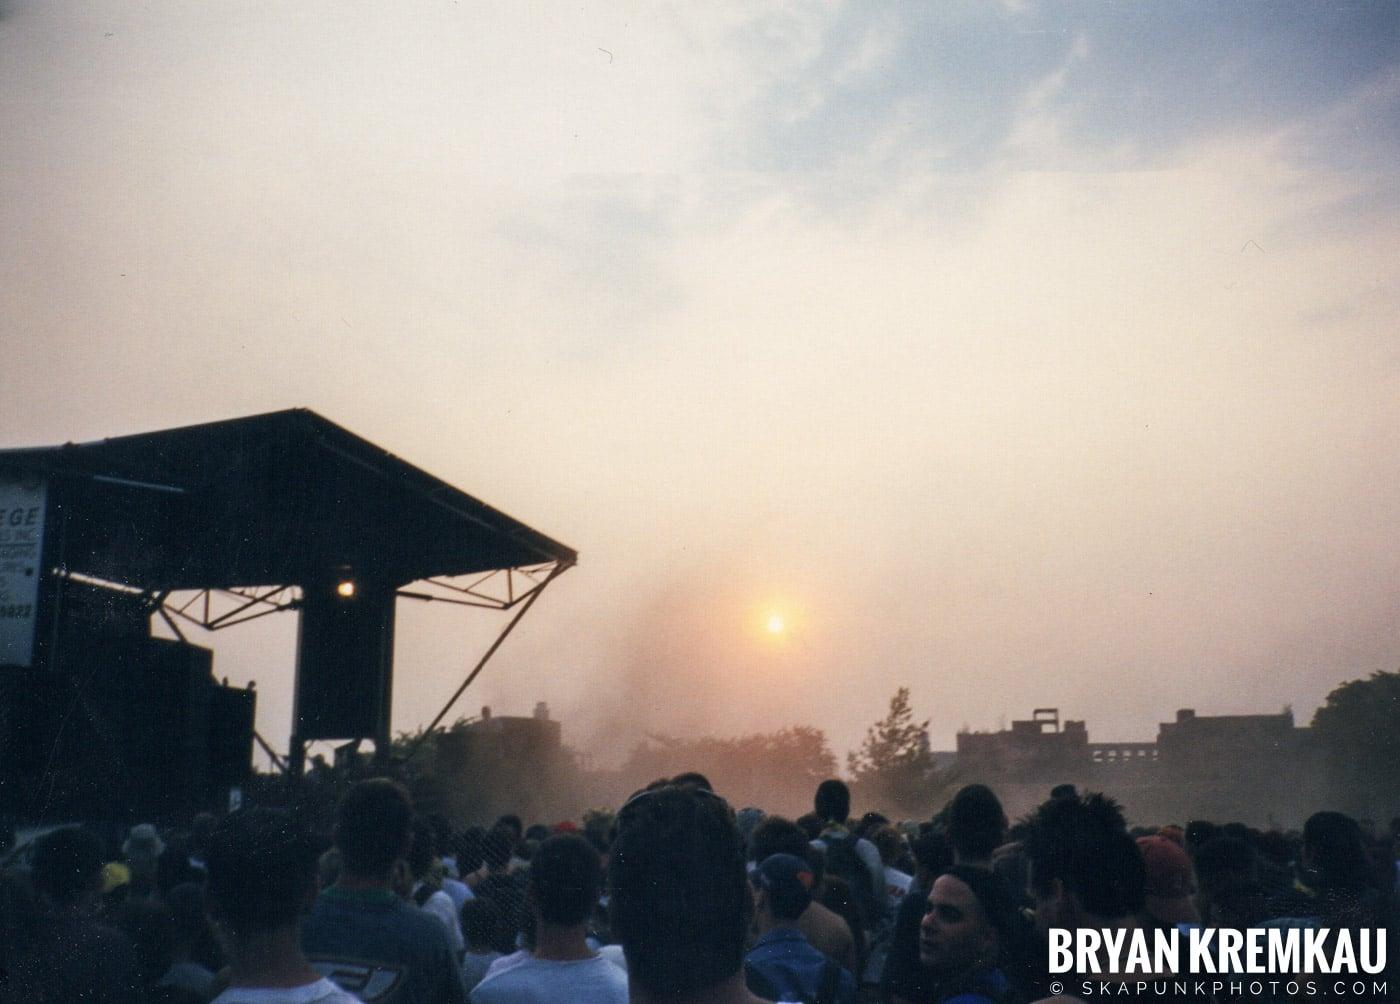 Crowd Shots @ Vans Warped Tour, Randall's Island, NYC - 7.16.99 (4)